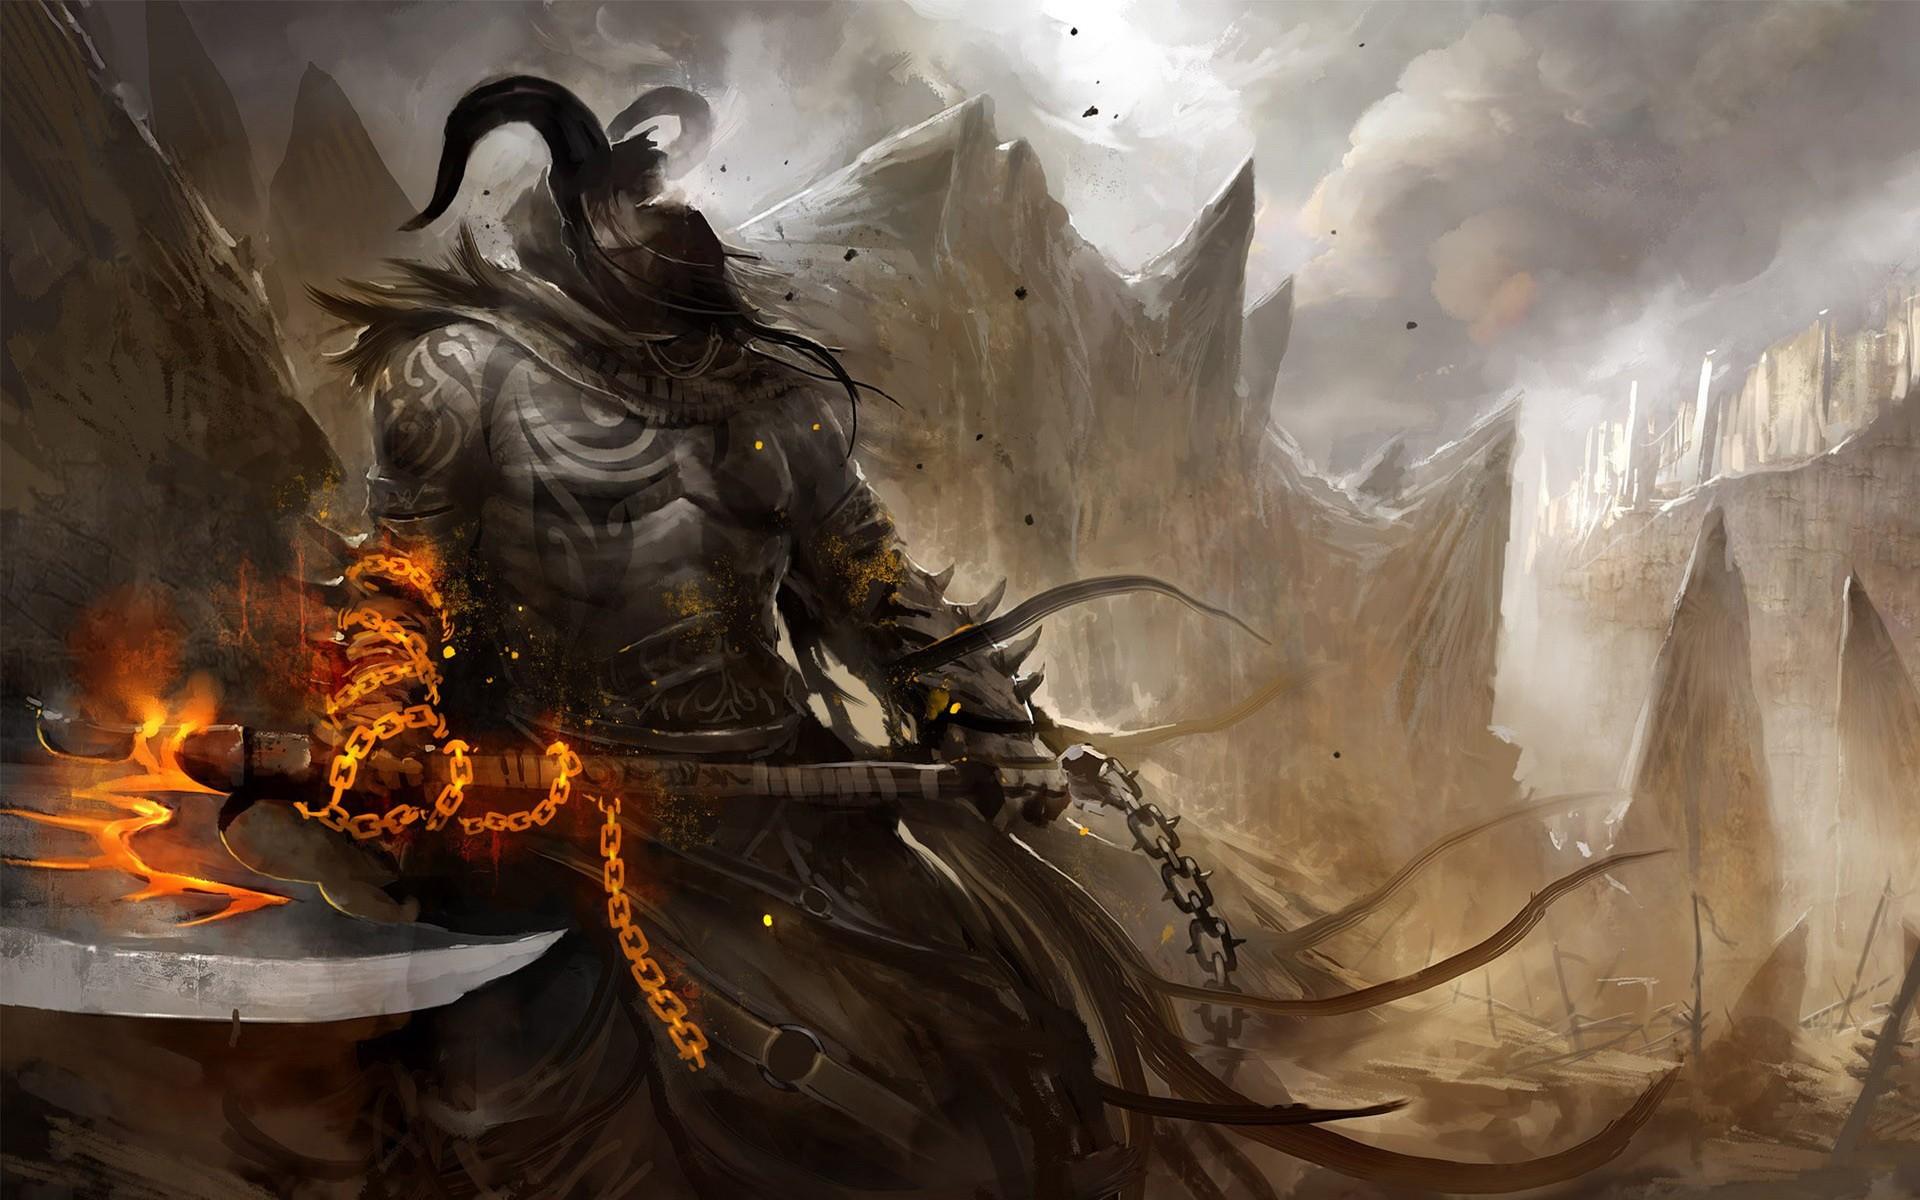 Fantasy desktop wallpaper download free cool full hd - Fantasy desktop pictures ...